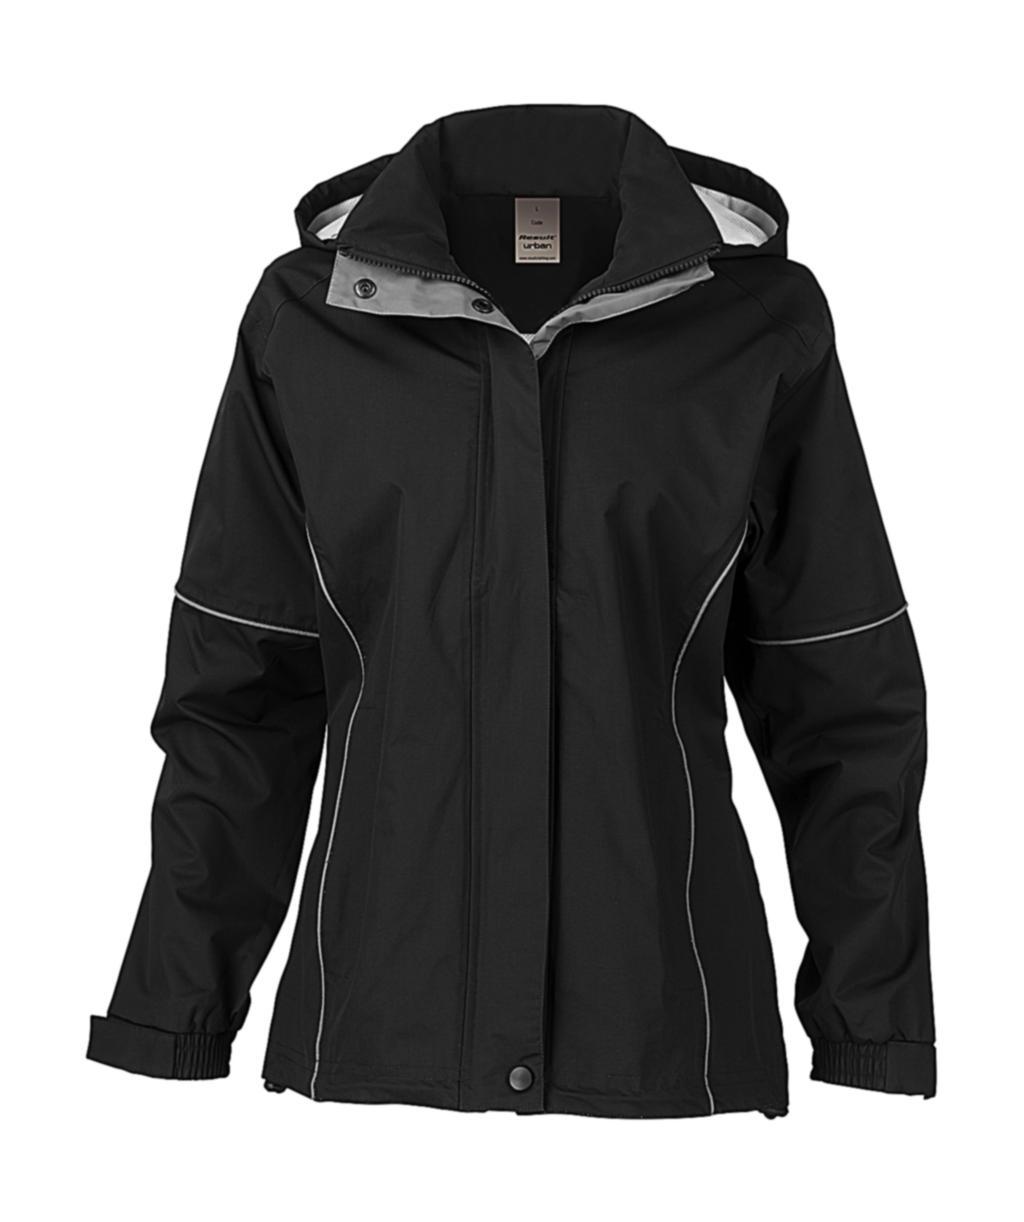 Ladies Urban Fell Lightweight Jacket